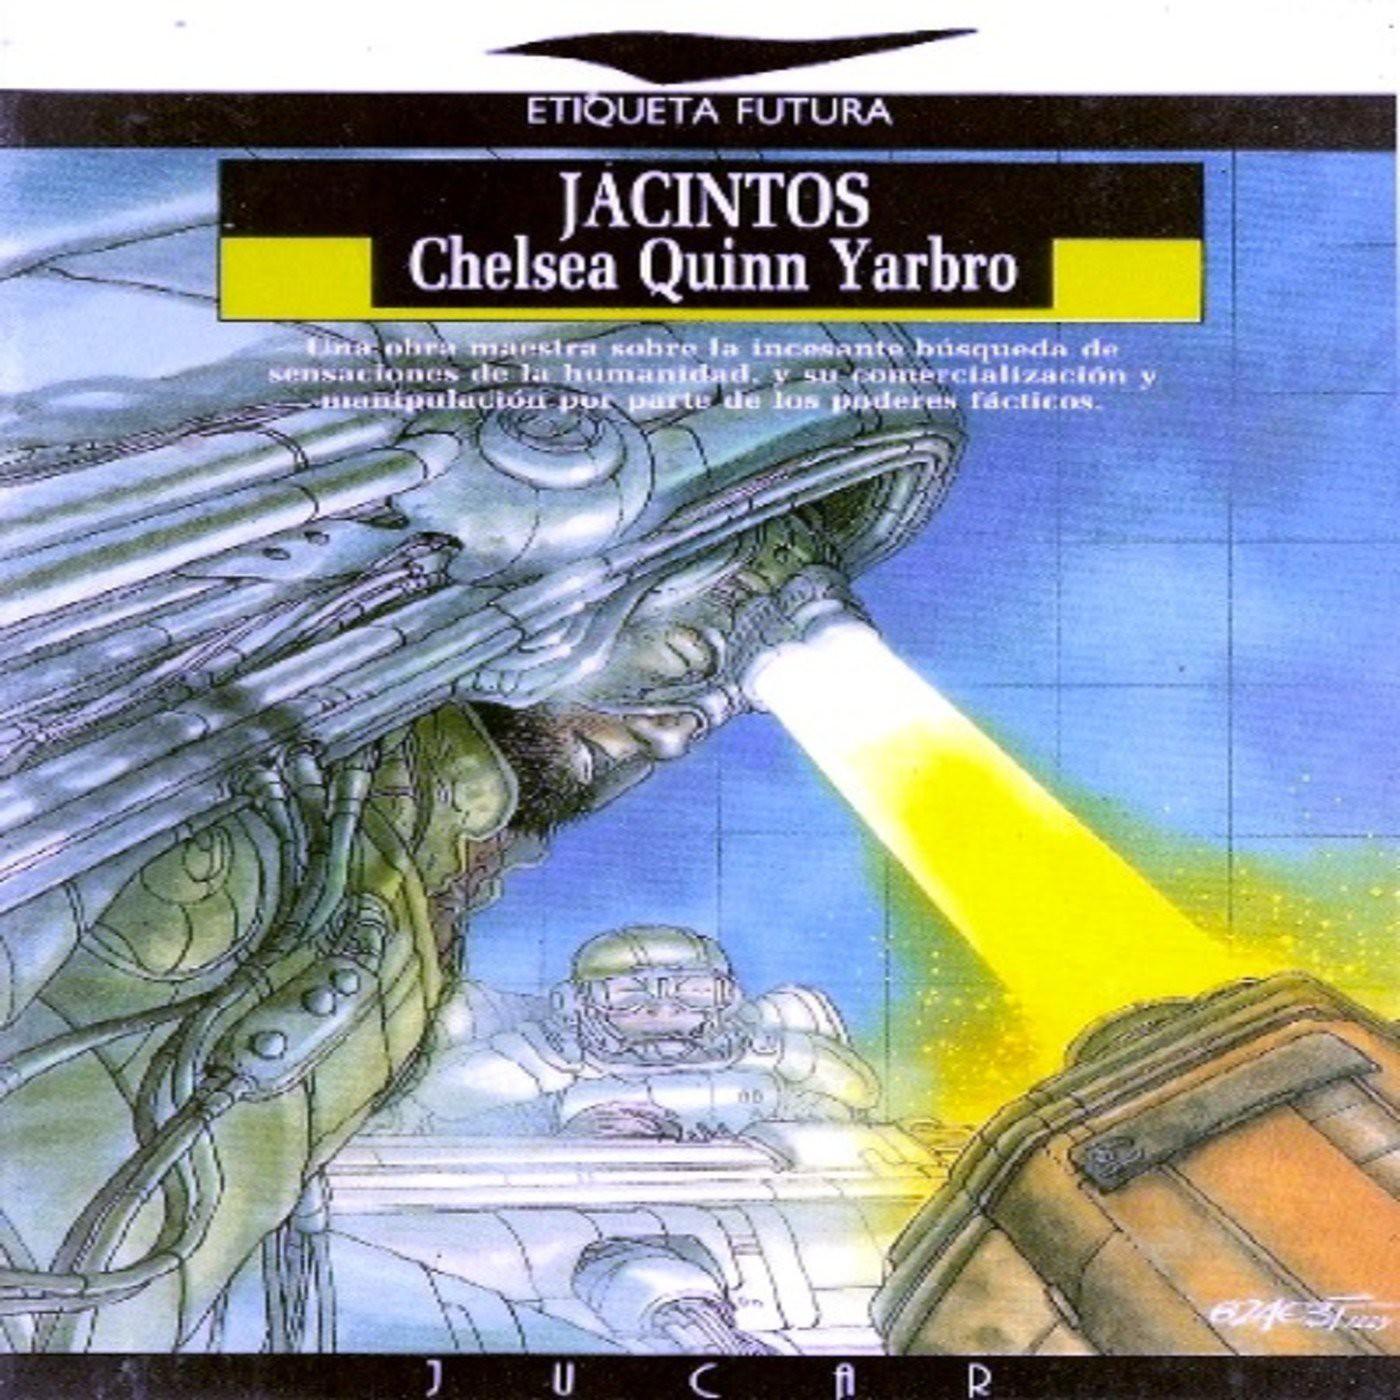 Jacintos De Chelsea Quinn Yarbro